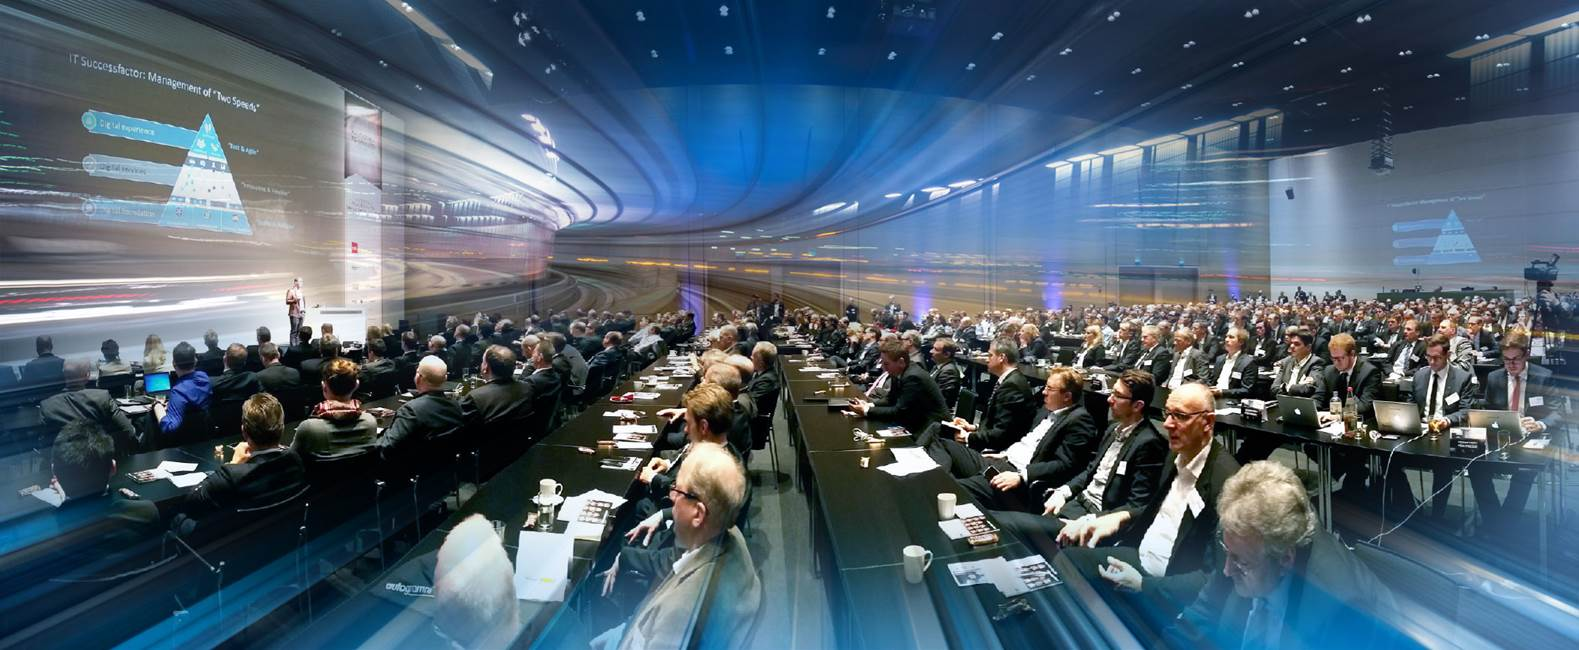 slider_automotiveit_kongress_2017